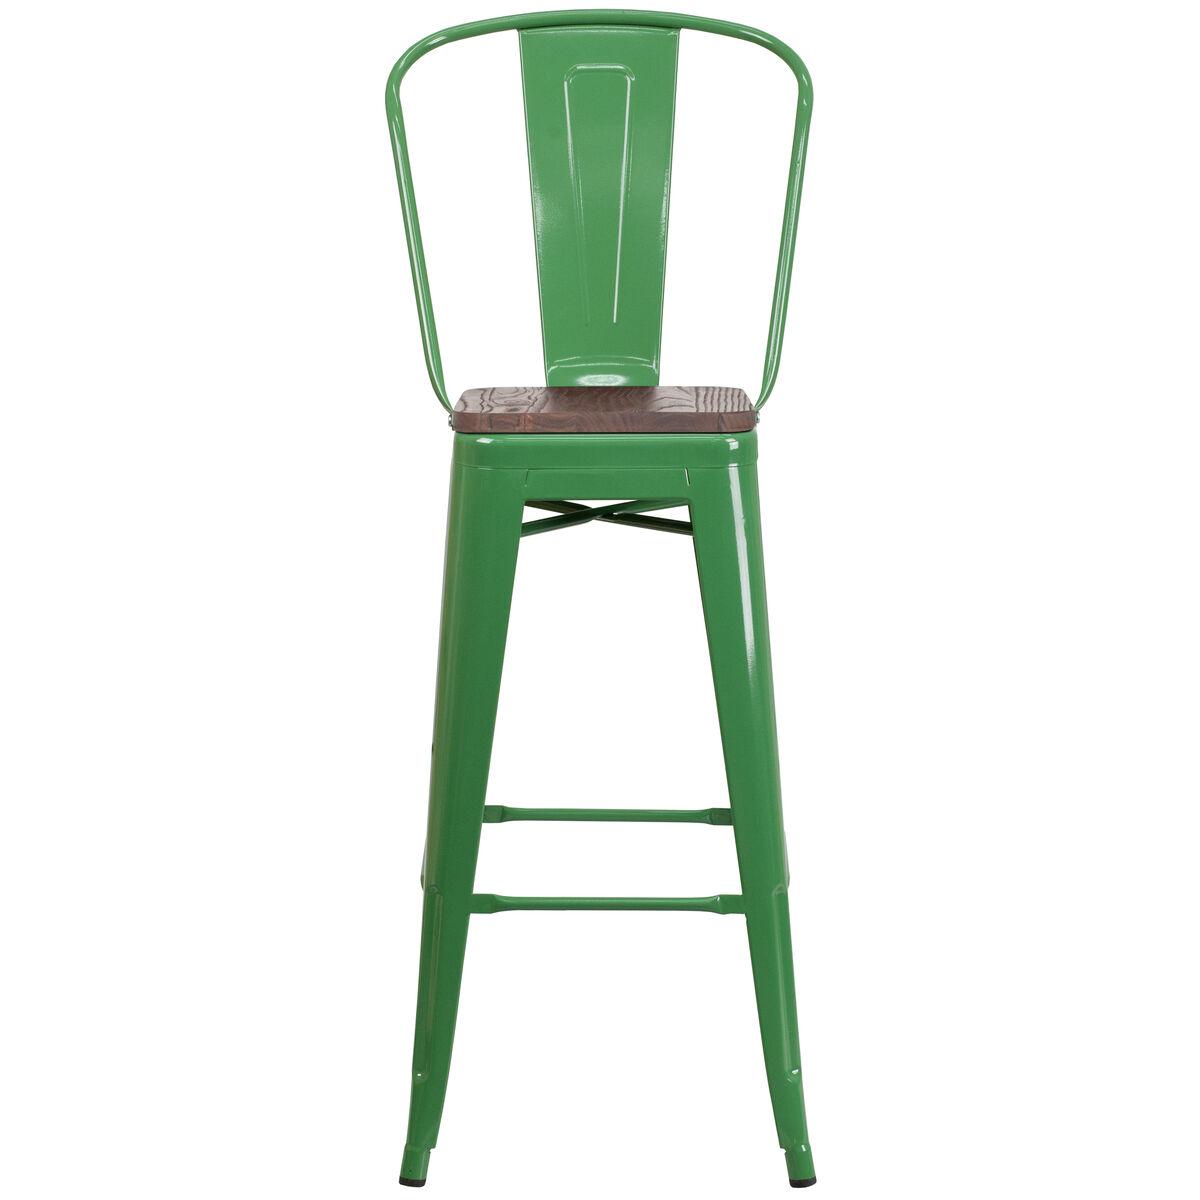 30 Green Metal Barstool Ch 31320 30gb Gn Wd Gg Bestchiavarichairscom